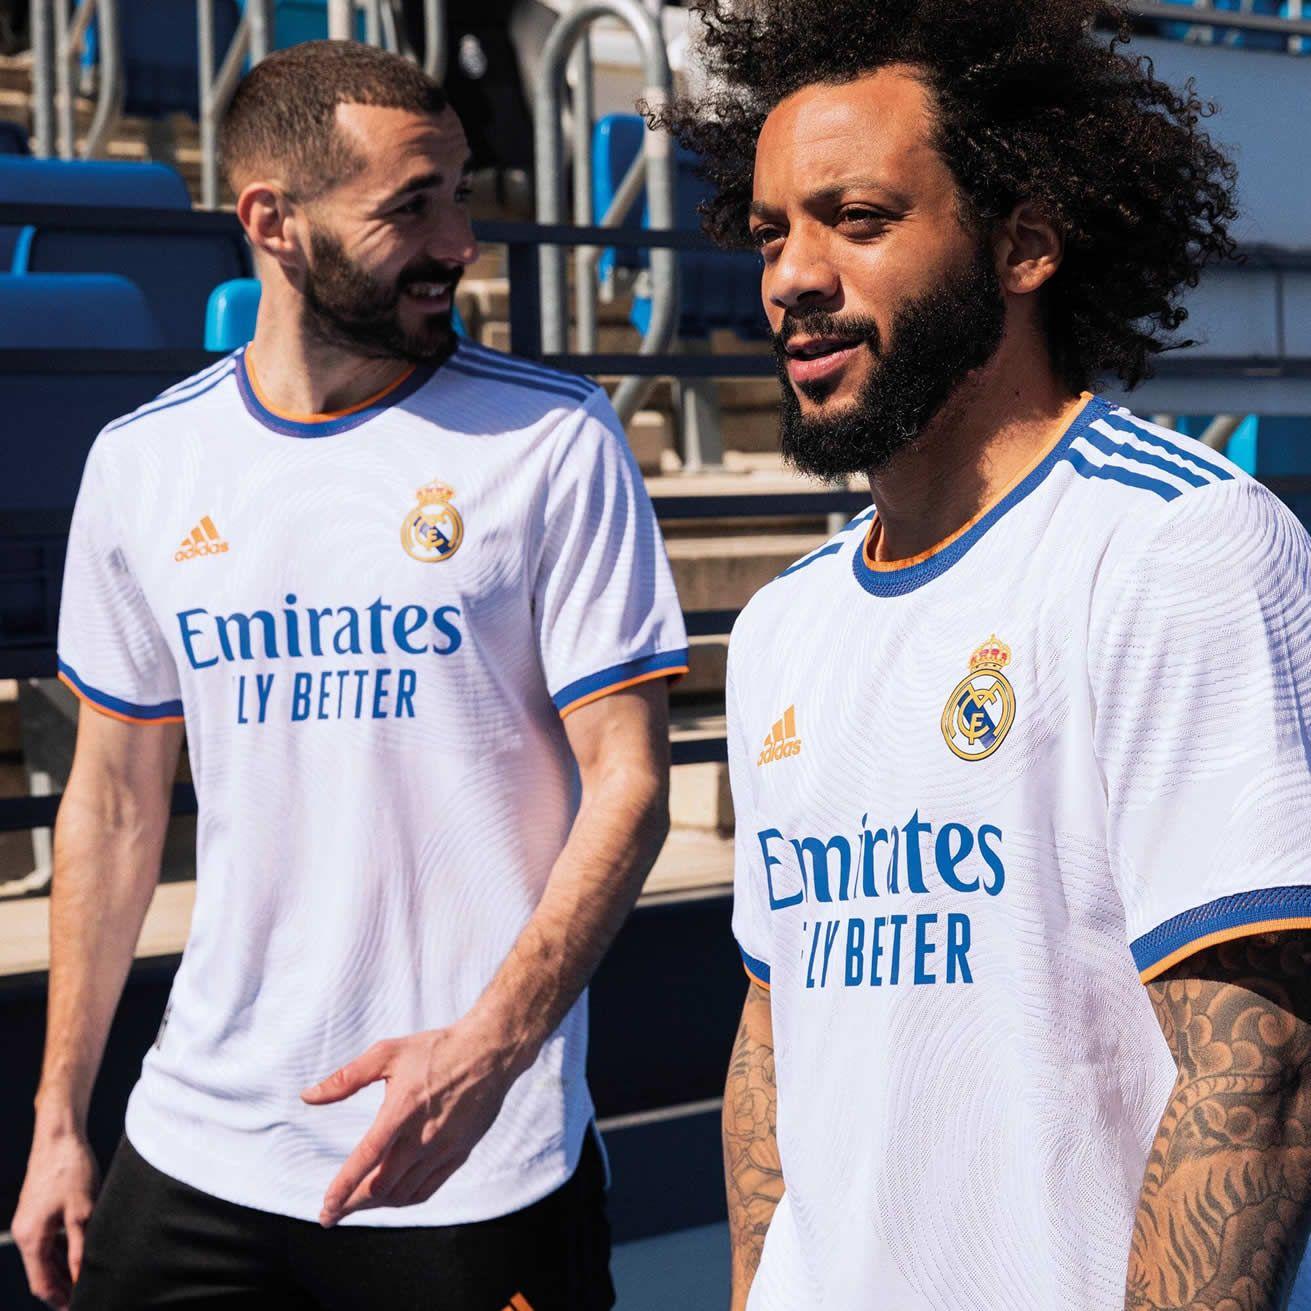 Camiseta titular del Real Madrid 2021/22 | Imagen adidas